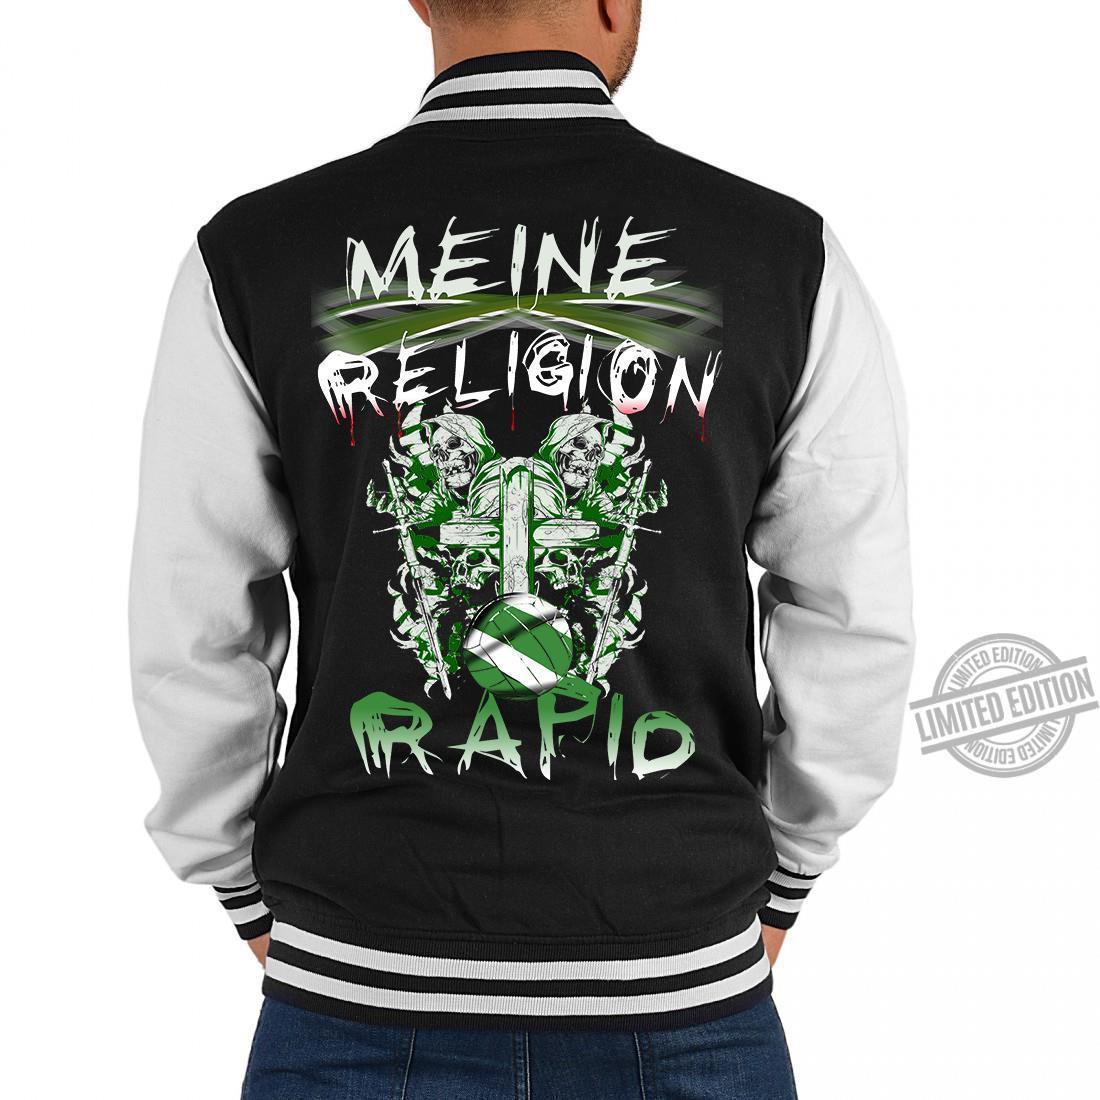 Meine Religion Rapio Shirt